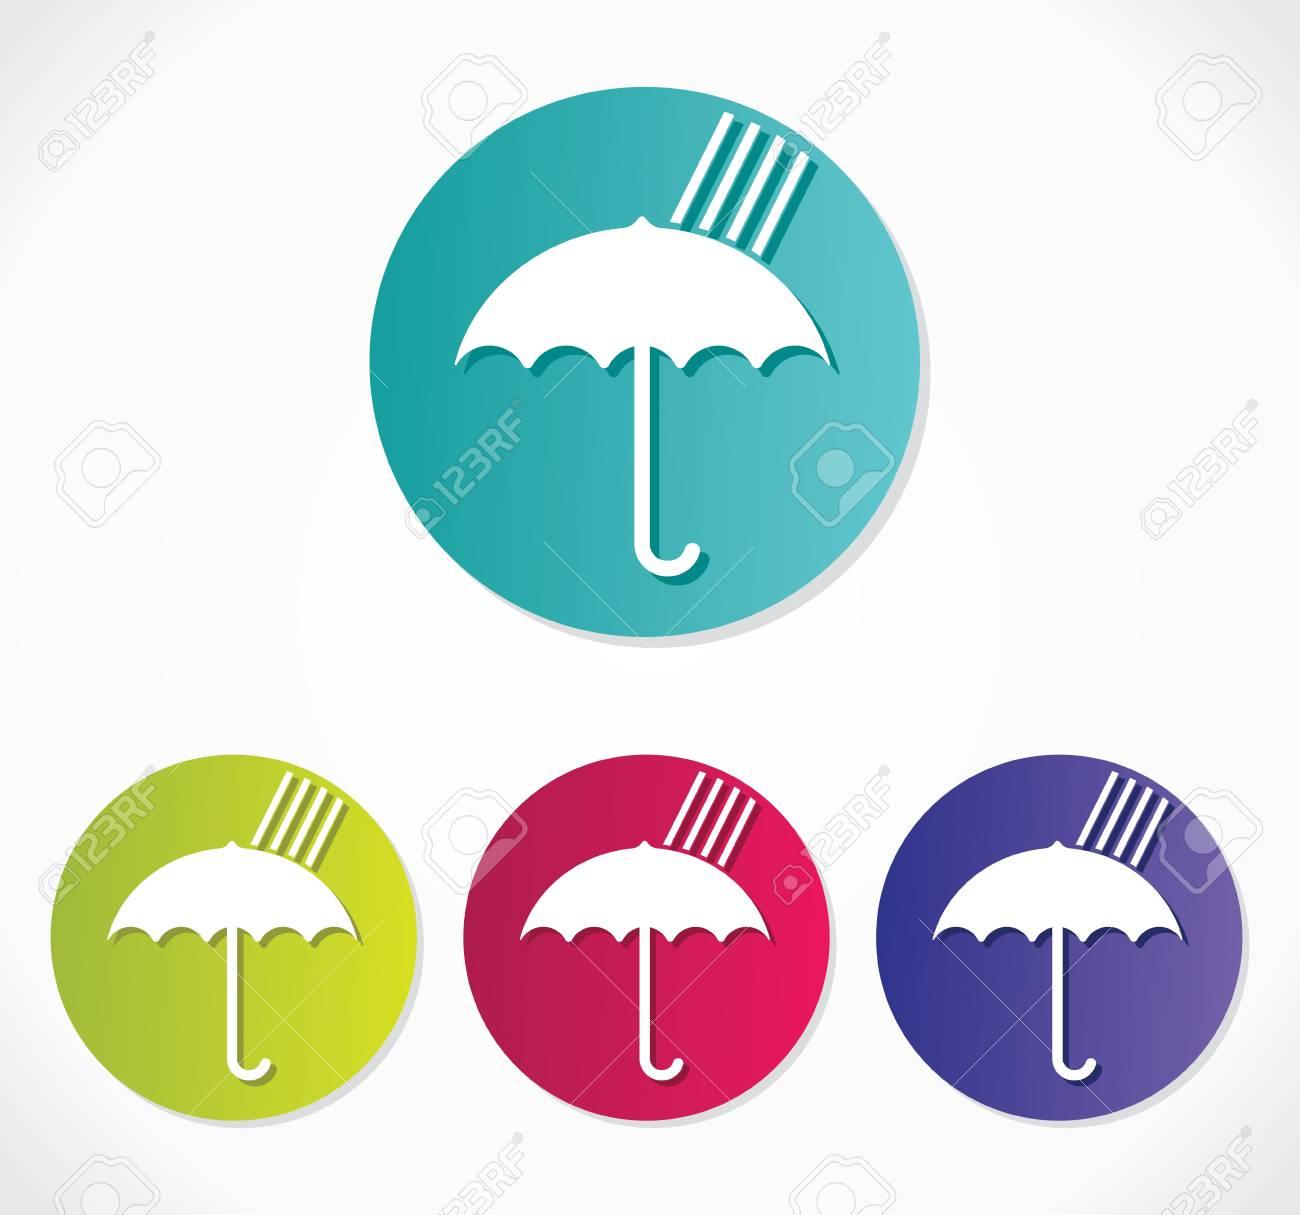 Umbrella icon Stock Vector - 19134320